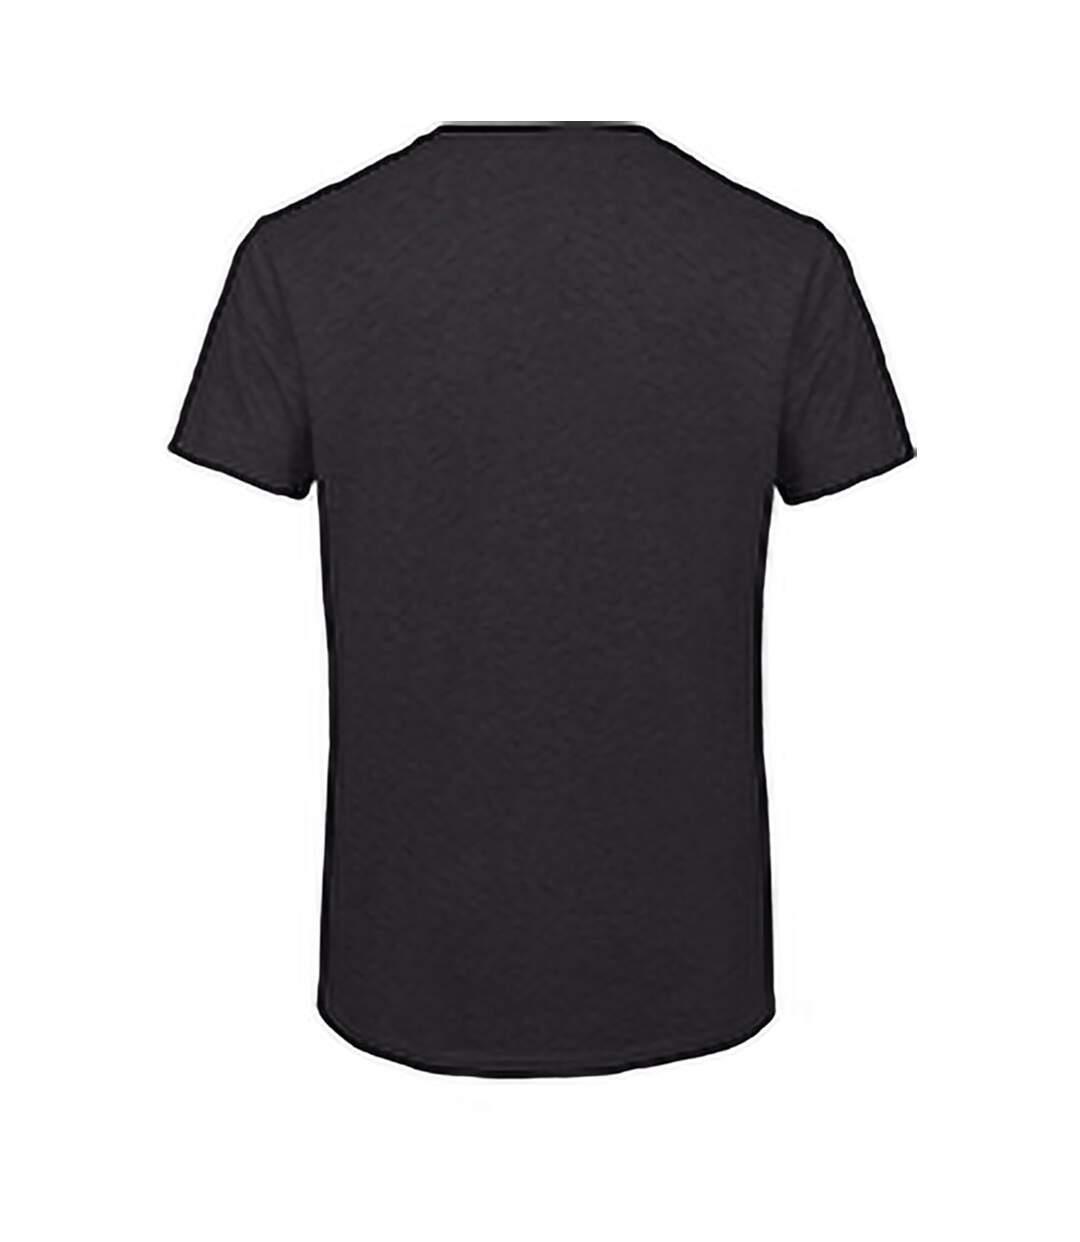 B&C Mens Favourite Short Sleeve Triblend T-Shirt (Heather Dark Grey) - UTBC3638